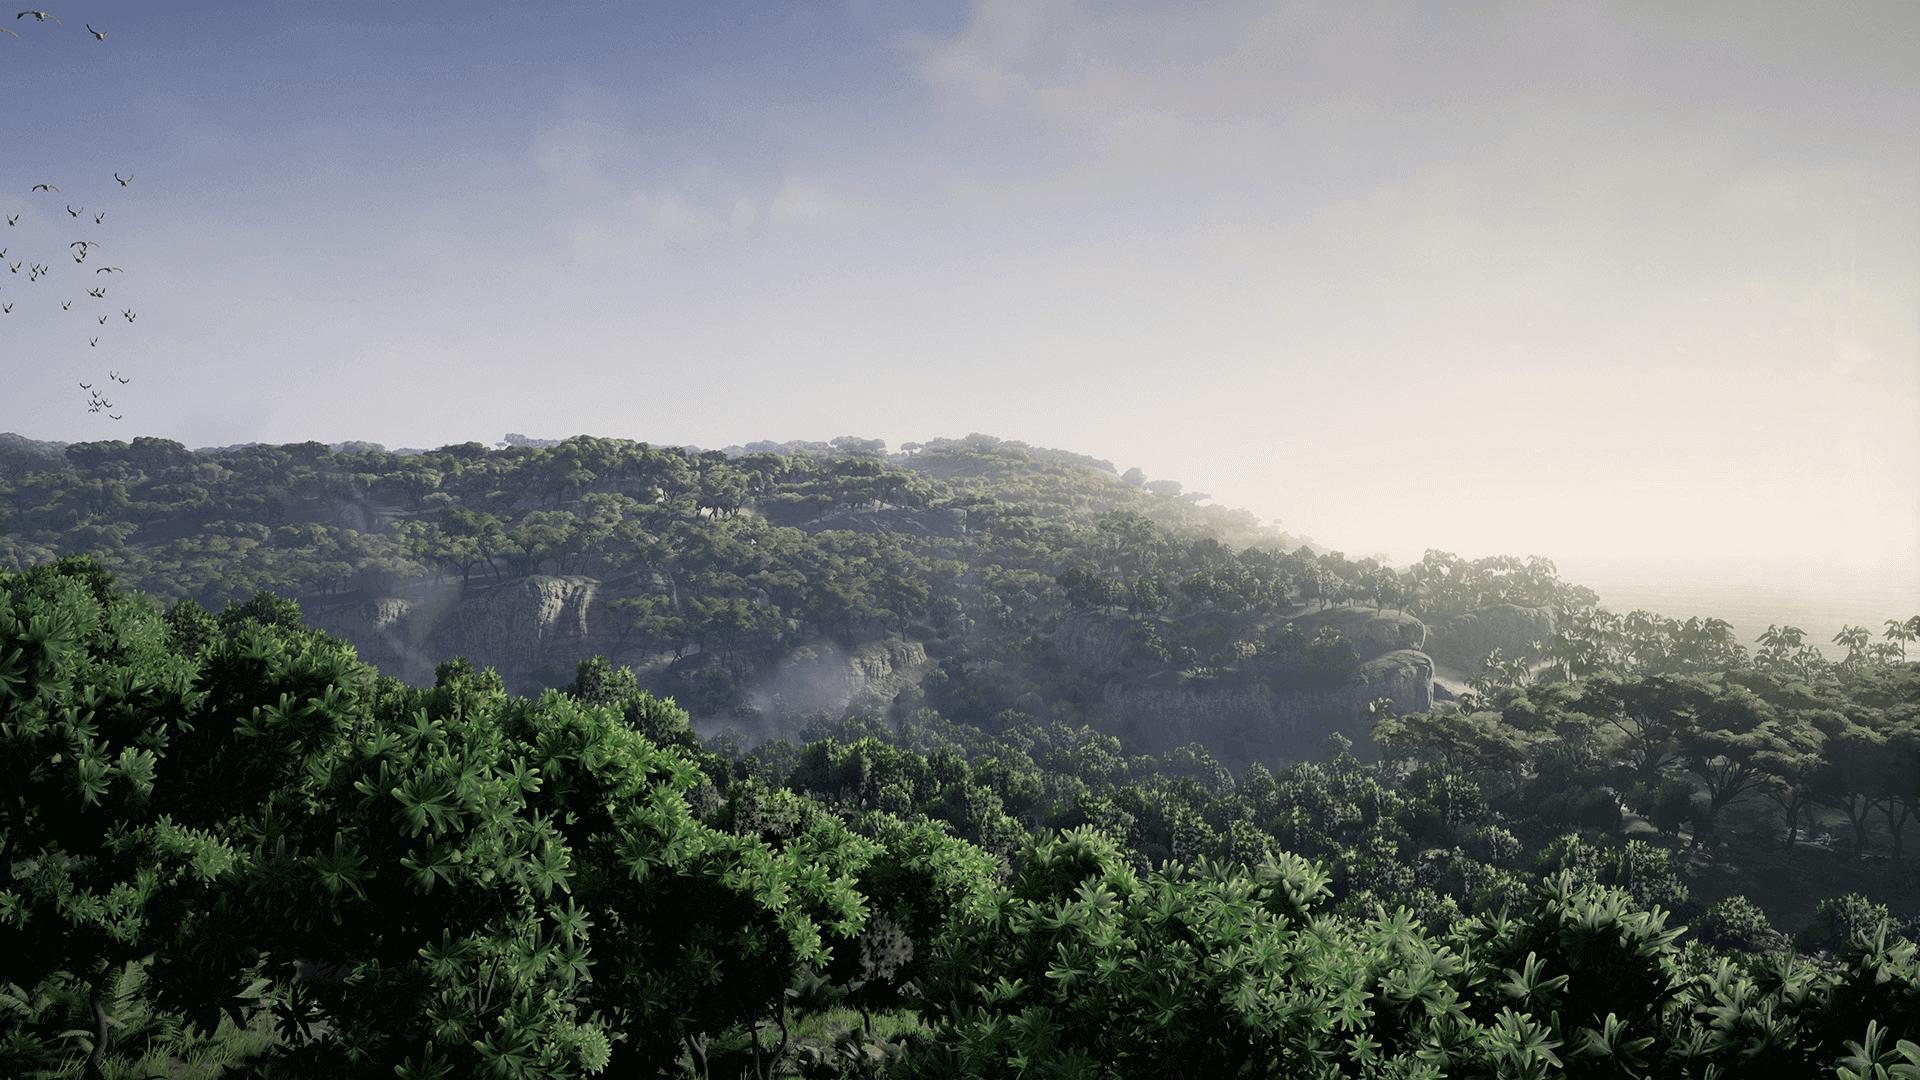 TropicalIsland Screenshot 07 1920x1080 a2e5e59a27a2055f69b2bb4d4fdb8787 - Tropical Island Environment - UE4热带岛屿环境资源